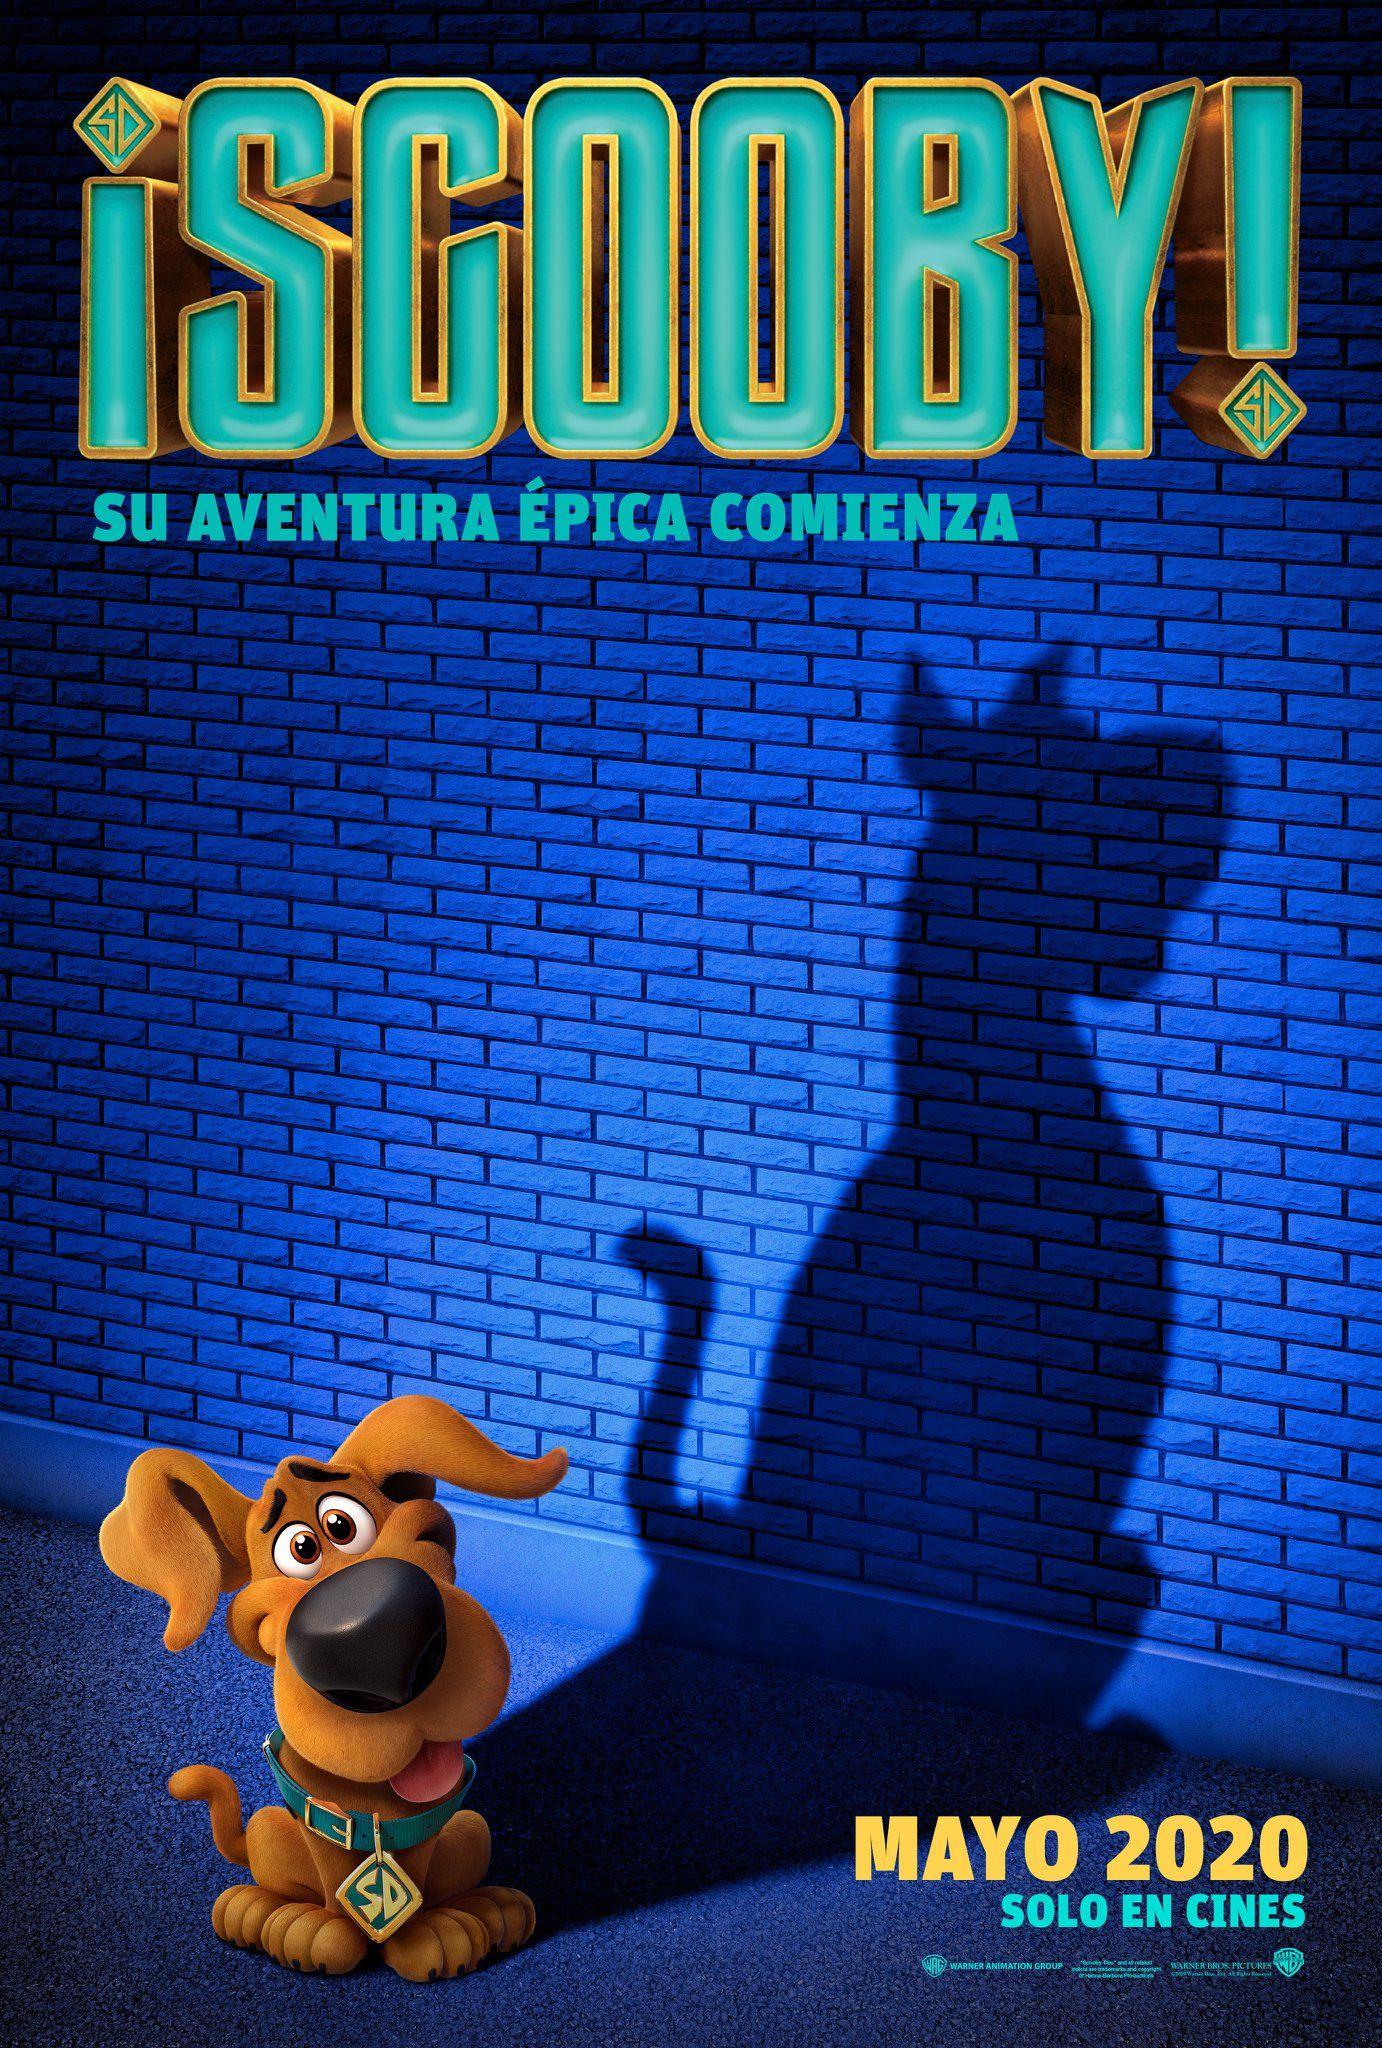 Scooby Trailer Oficial Poster Peliculas Completas Scooby Doo Pelicula Peliculas Completas Gratis